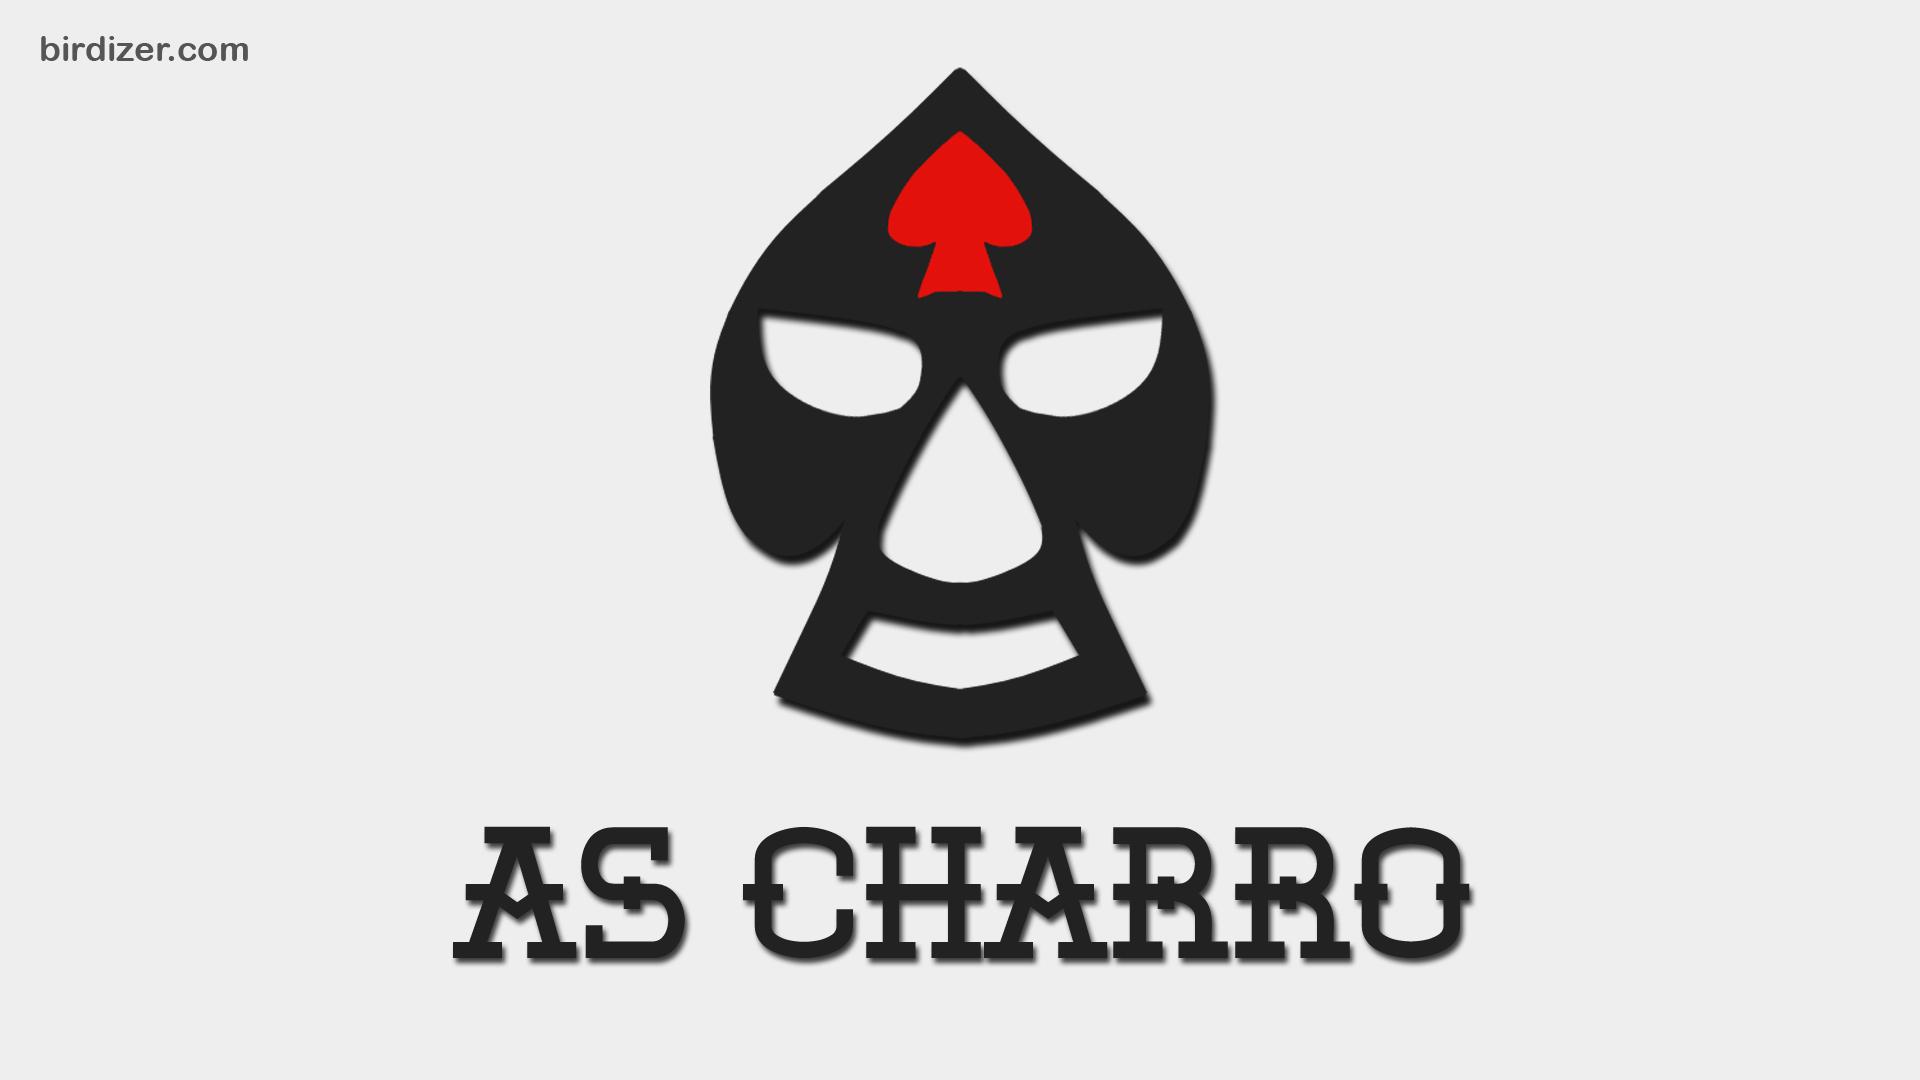 As Charro Mascara Wallpaper